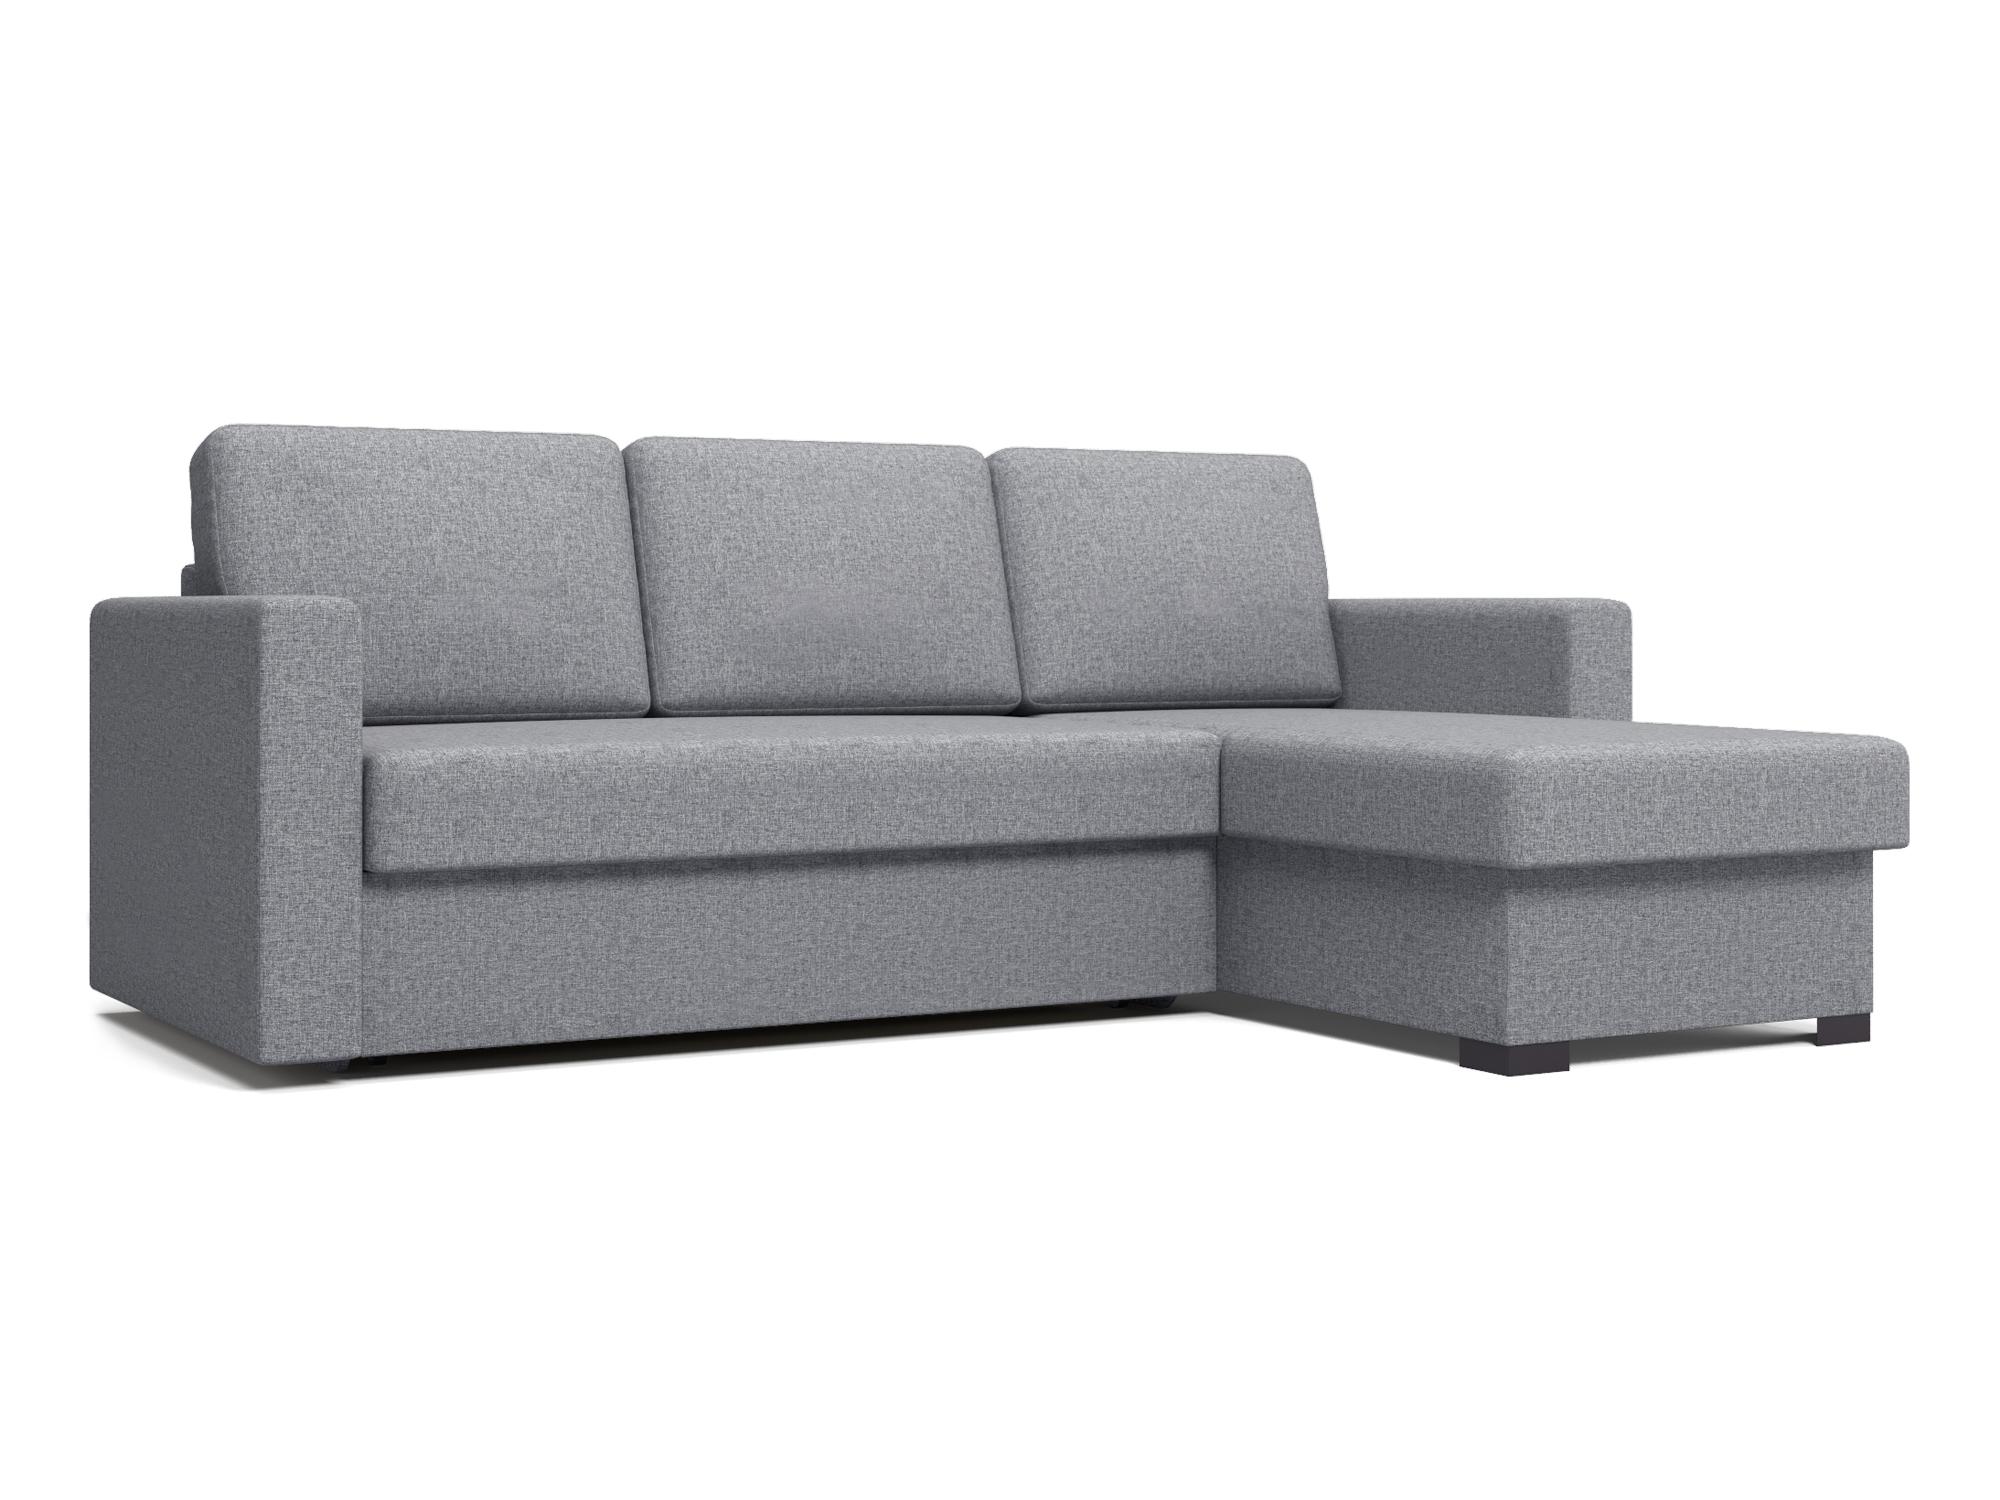 Угловой диван Траумберг (Порту, Торонто, Фишер) MebelVia Серый